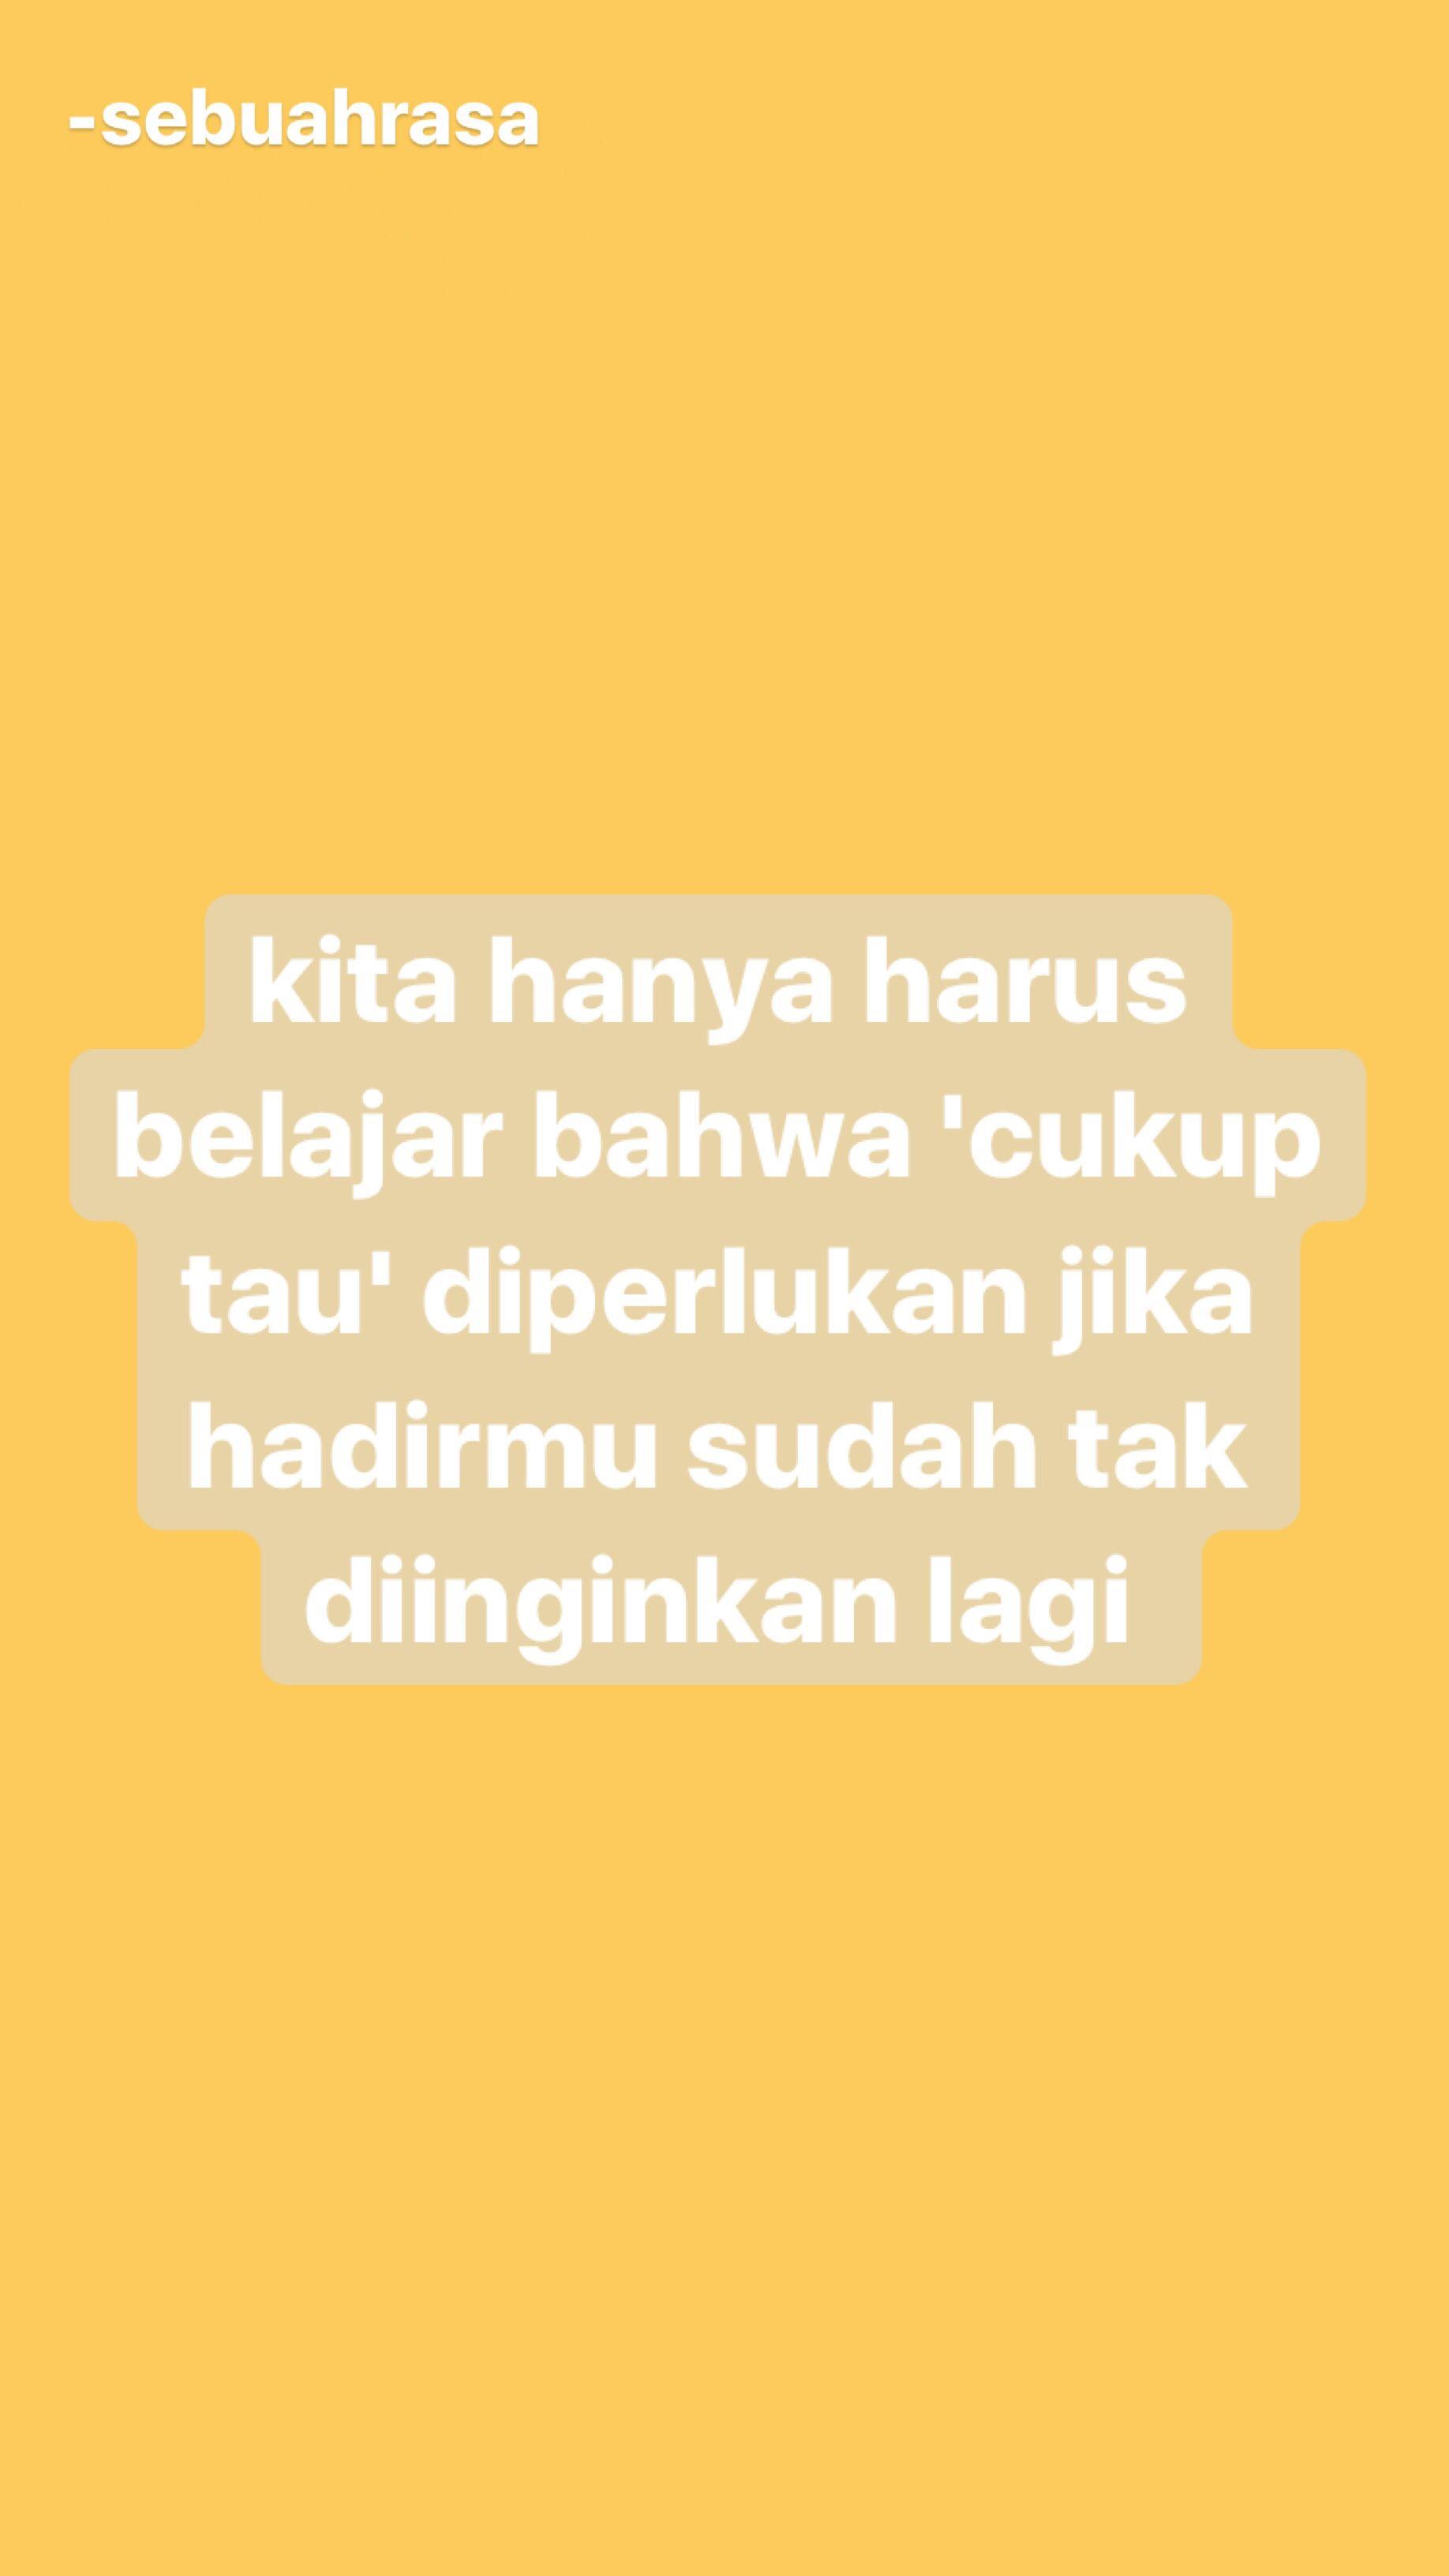 Ember ngapain jg sakit hahahaha Quotes Indonesia Hurt Quotes Muslim Quotes Life